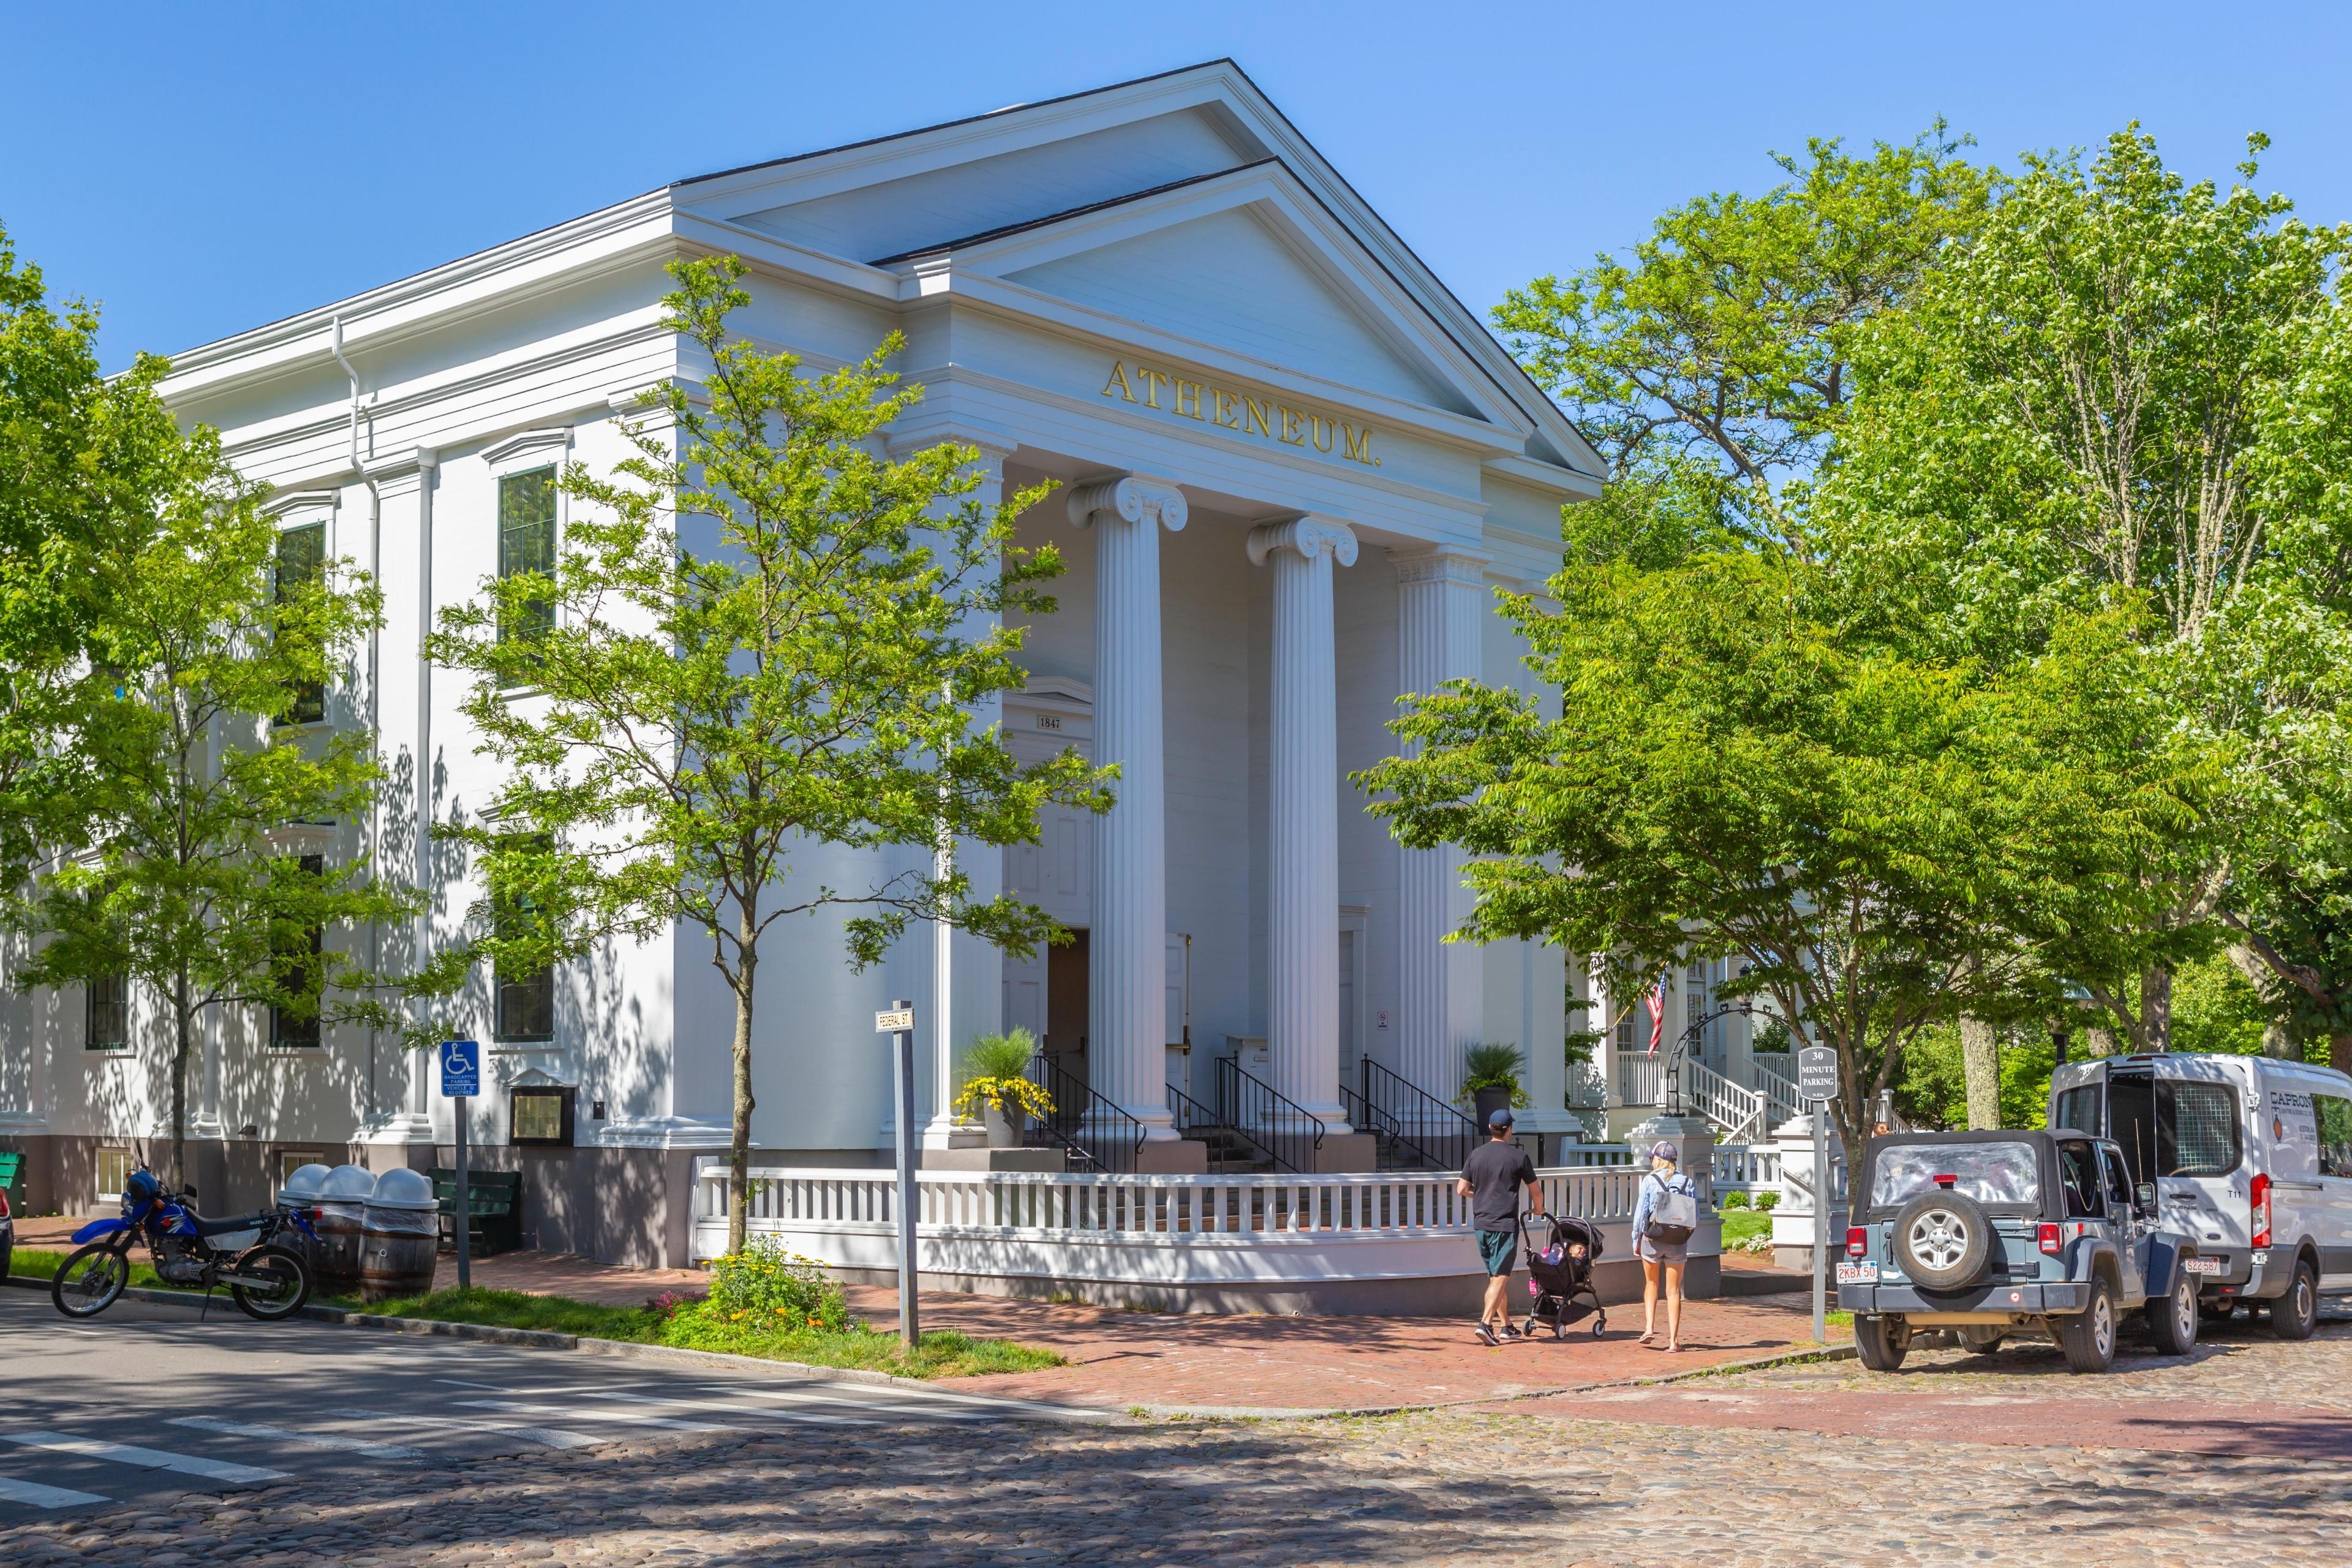 Nantucket Atheneum, Nantucket, Massachusetts, Verenigde Staten